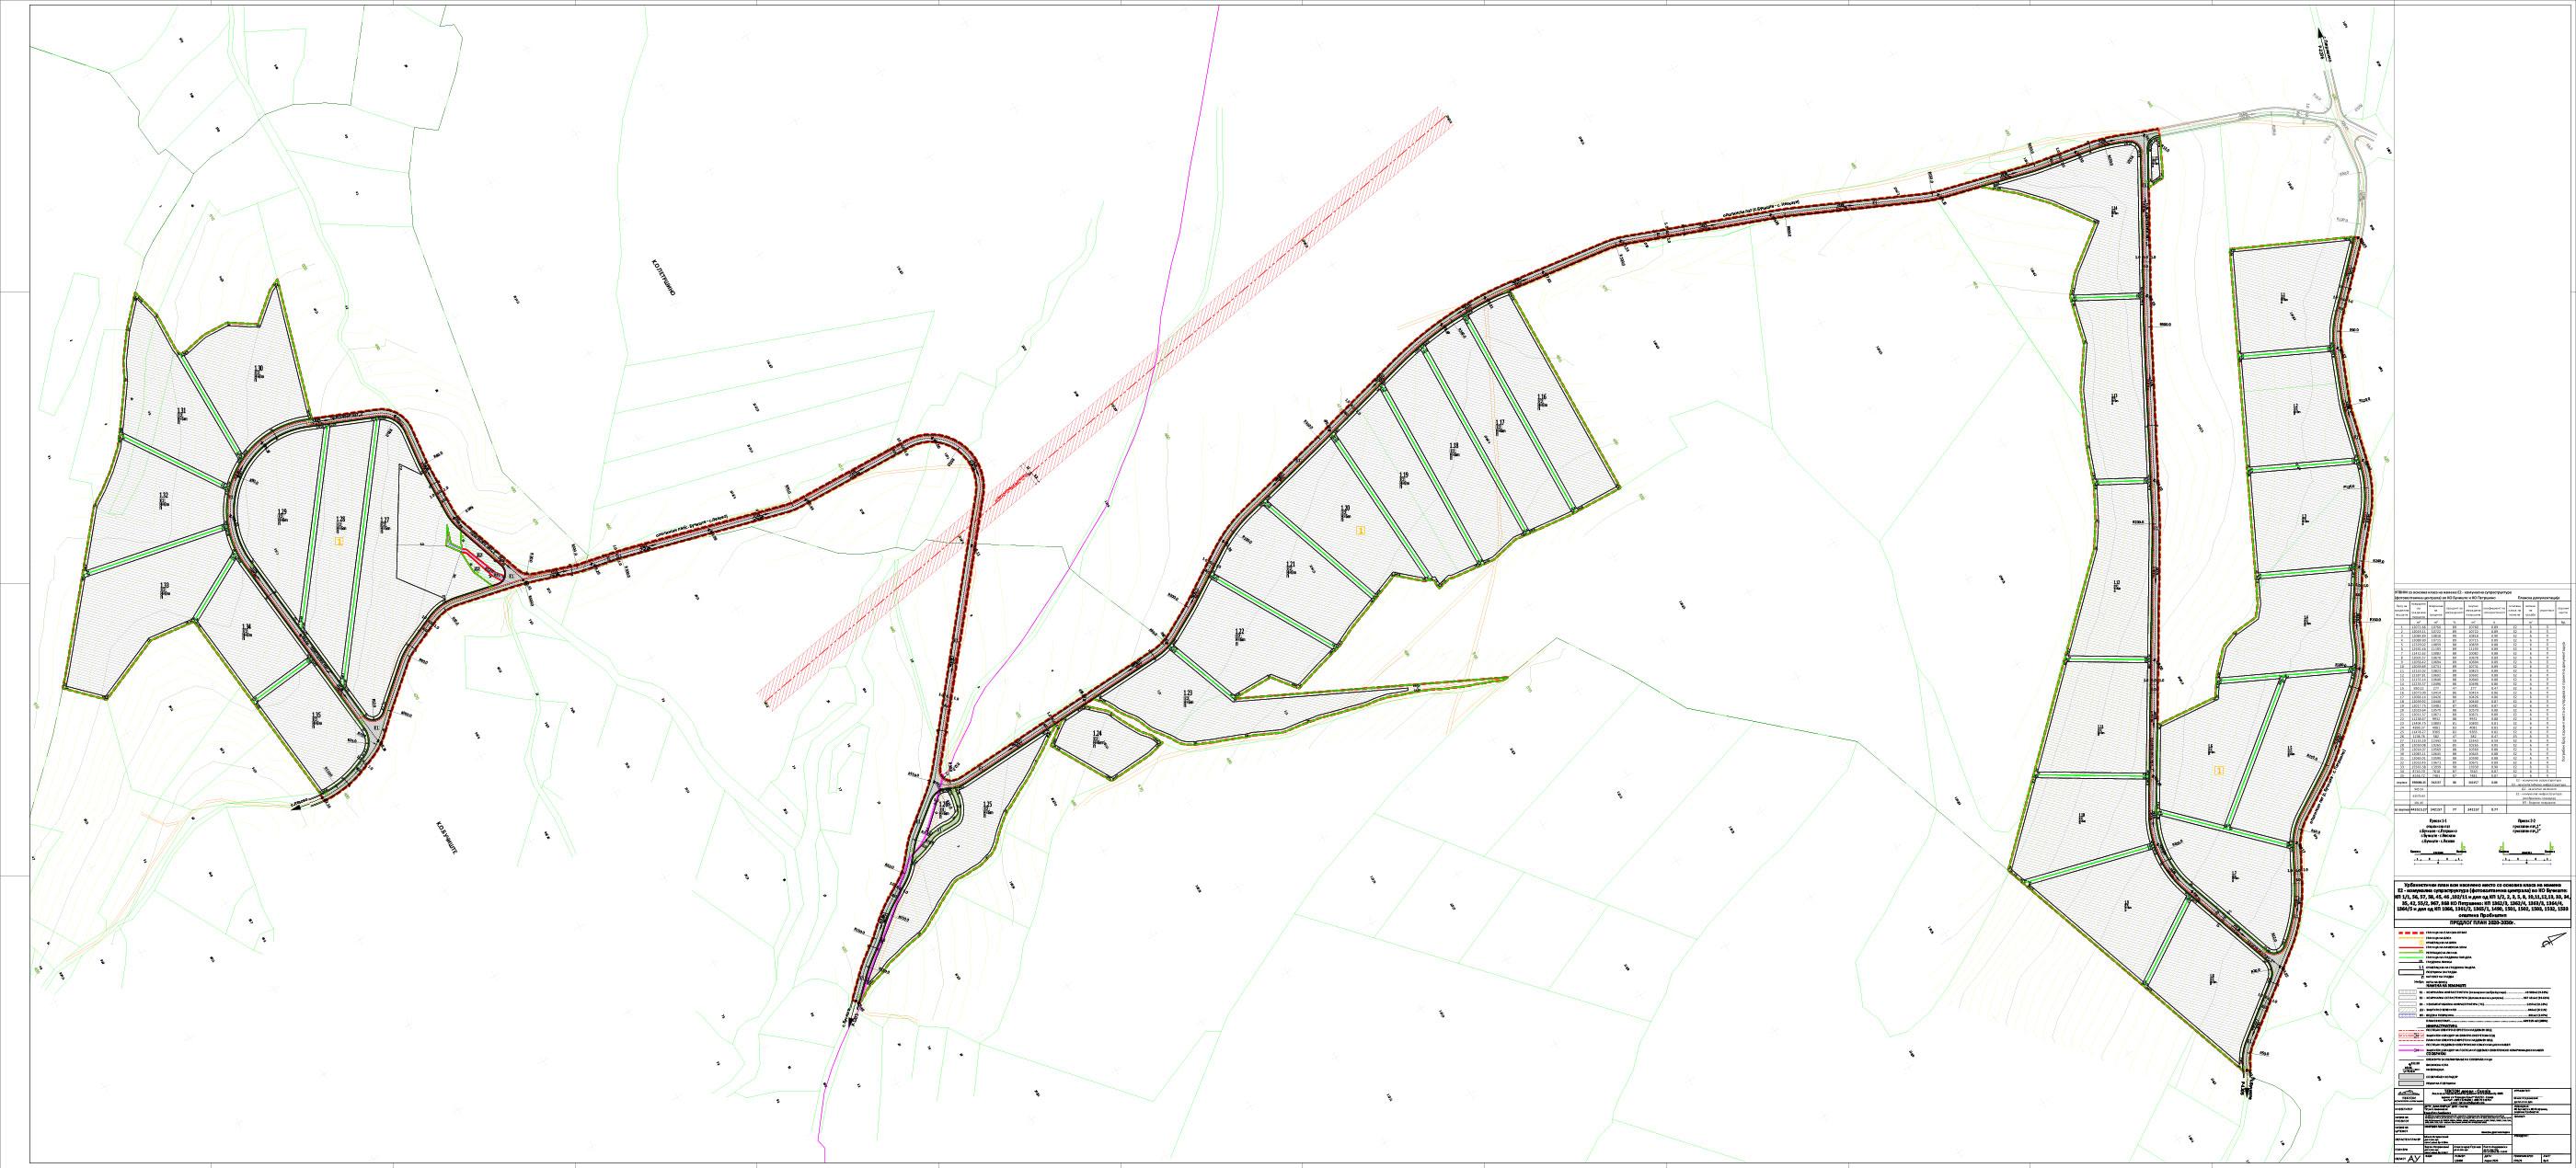 УПВНМ-фотоволтаична-централа-Е2---КО-Бучиште-и-КО-Петршино-општина-Пробиштип-12.05.2020-153